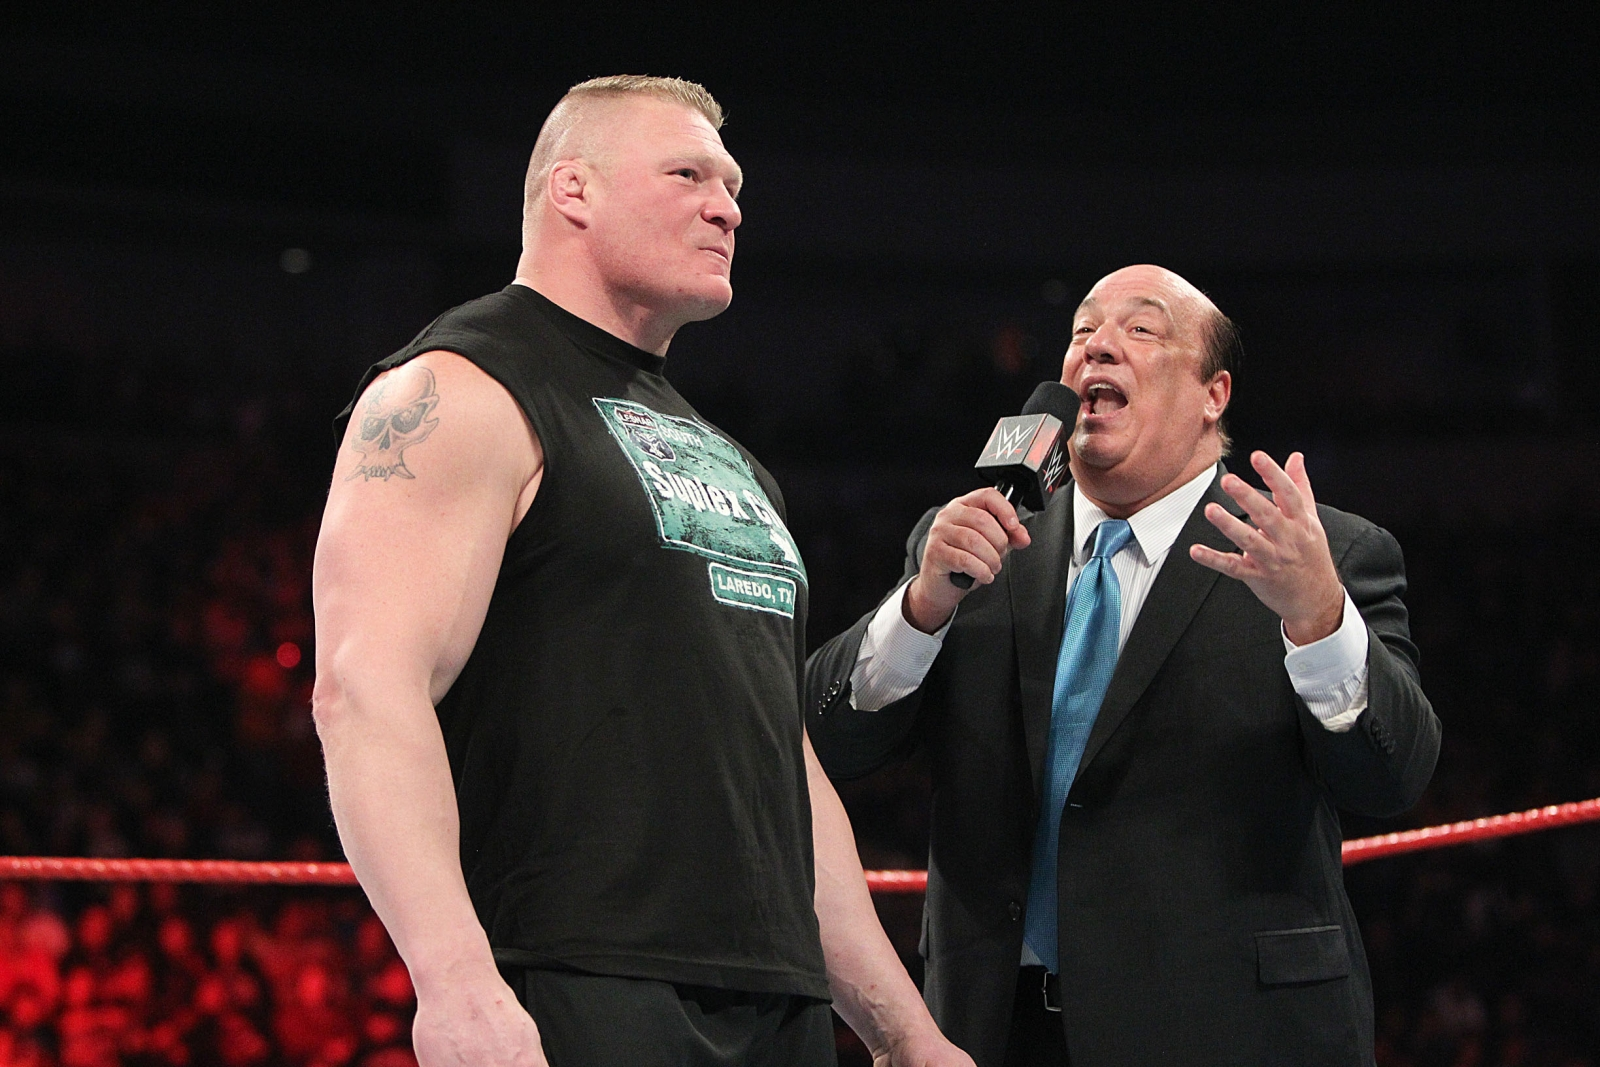 Brock Lesnar and Paul Heyman wwe